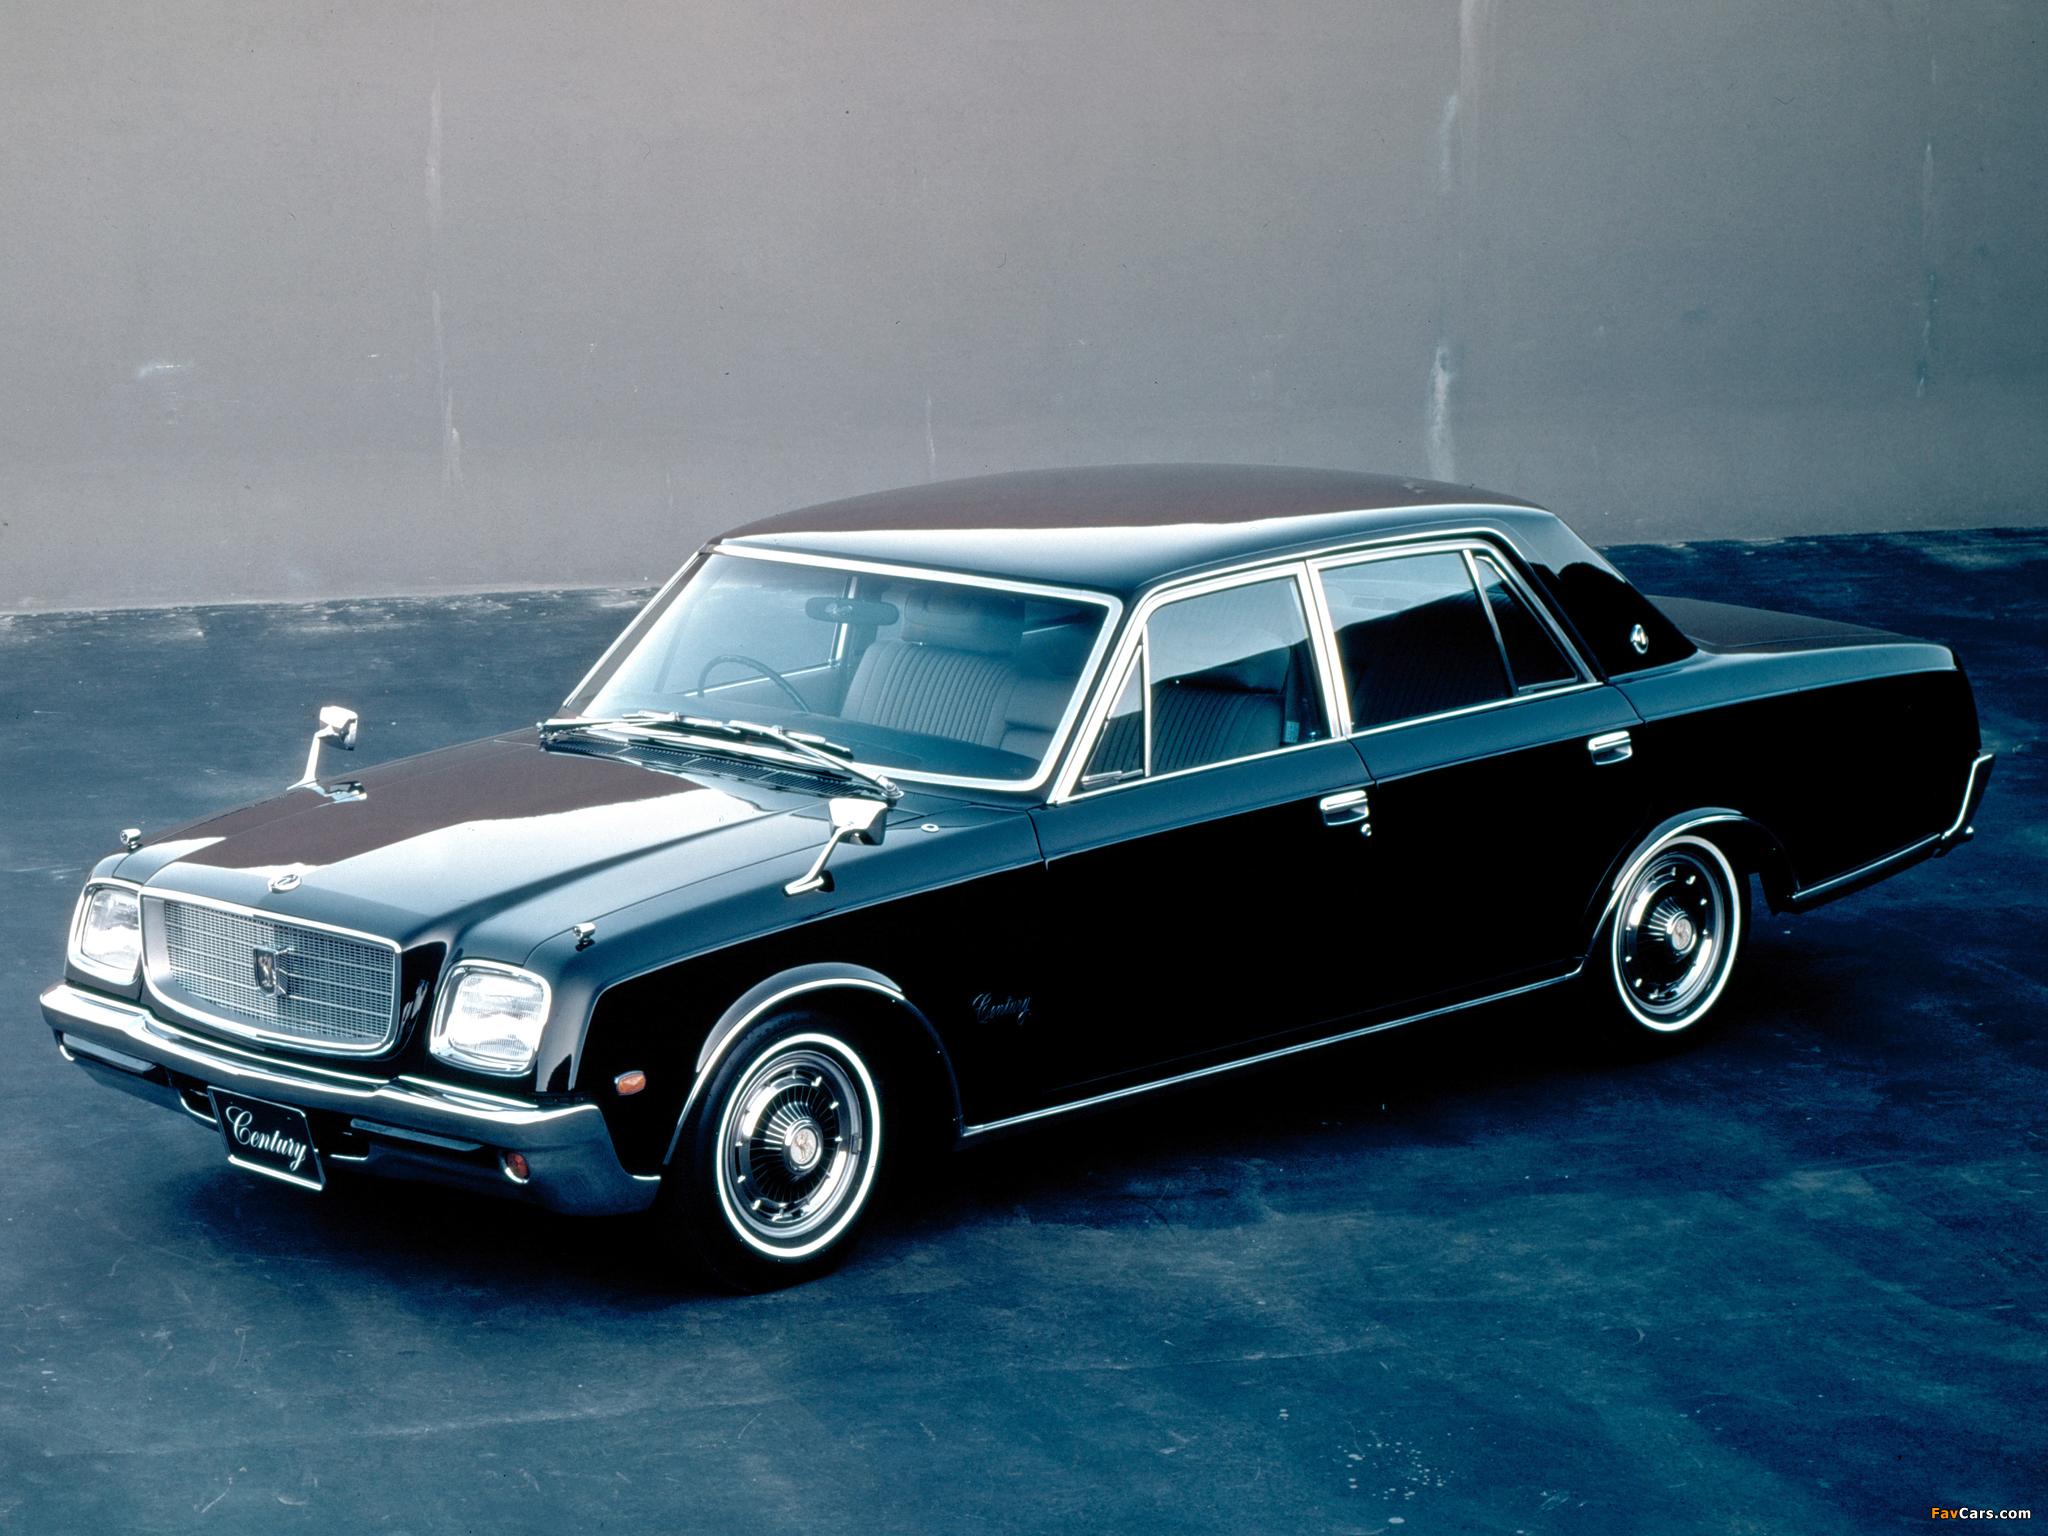 '67 Toyota Century| Open Classifieds forum